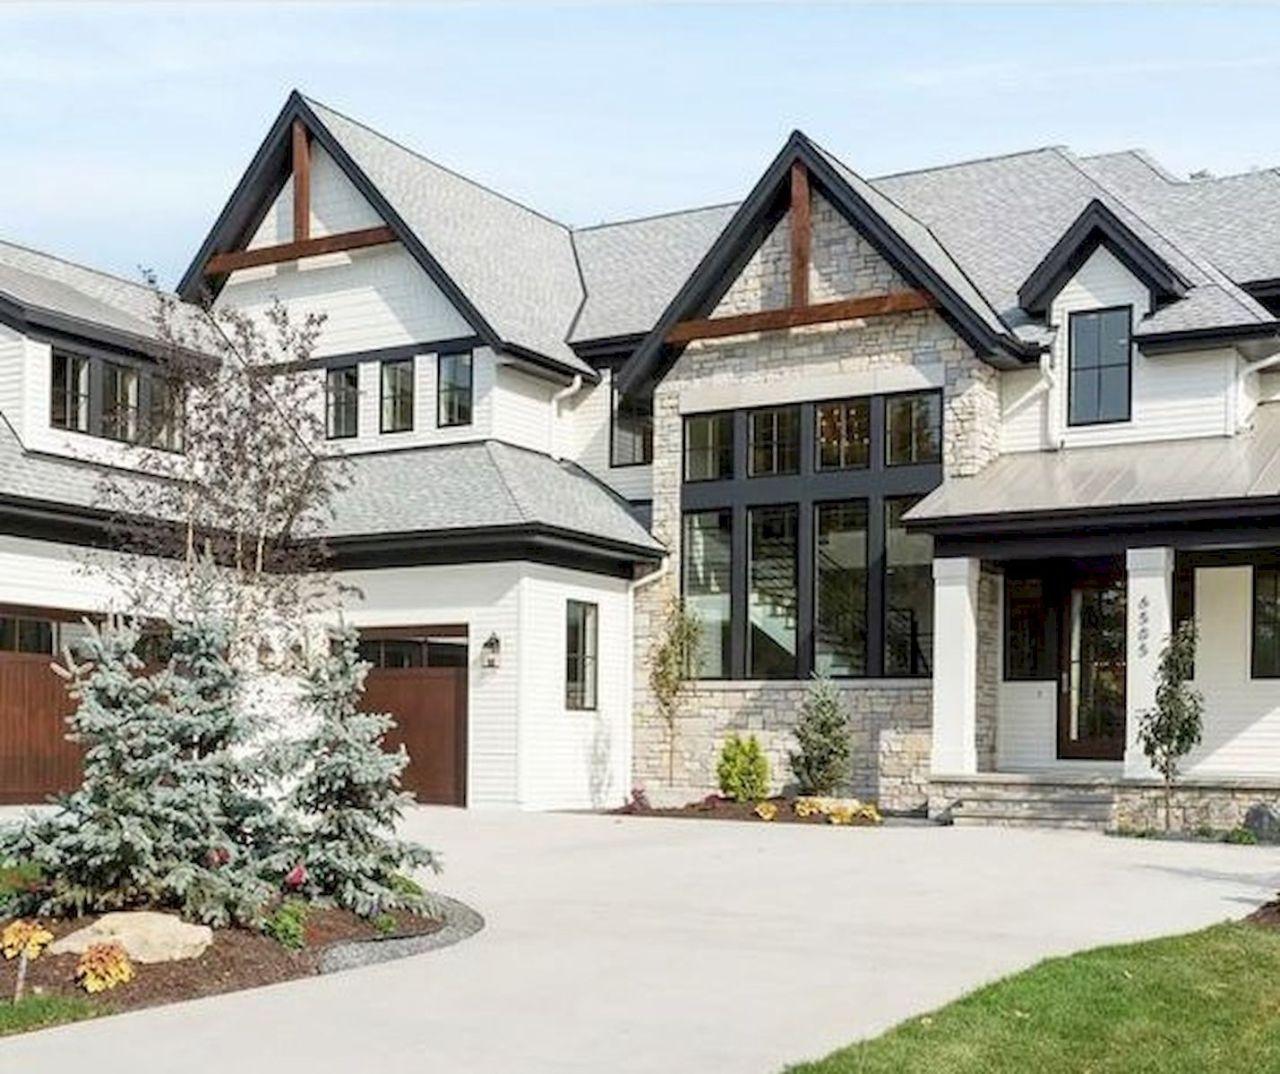 65 Stunning Modern Dream House Exterior Design Ideas (10) - Googodecor #exteriordesign